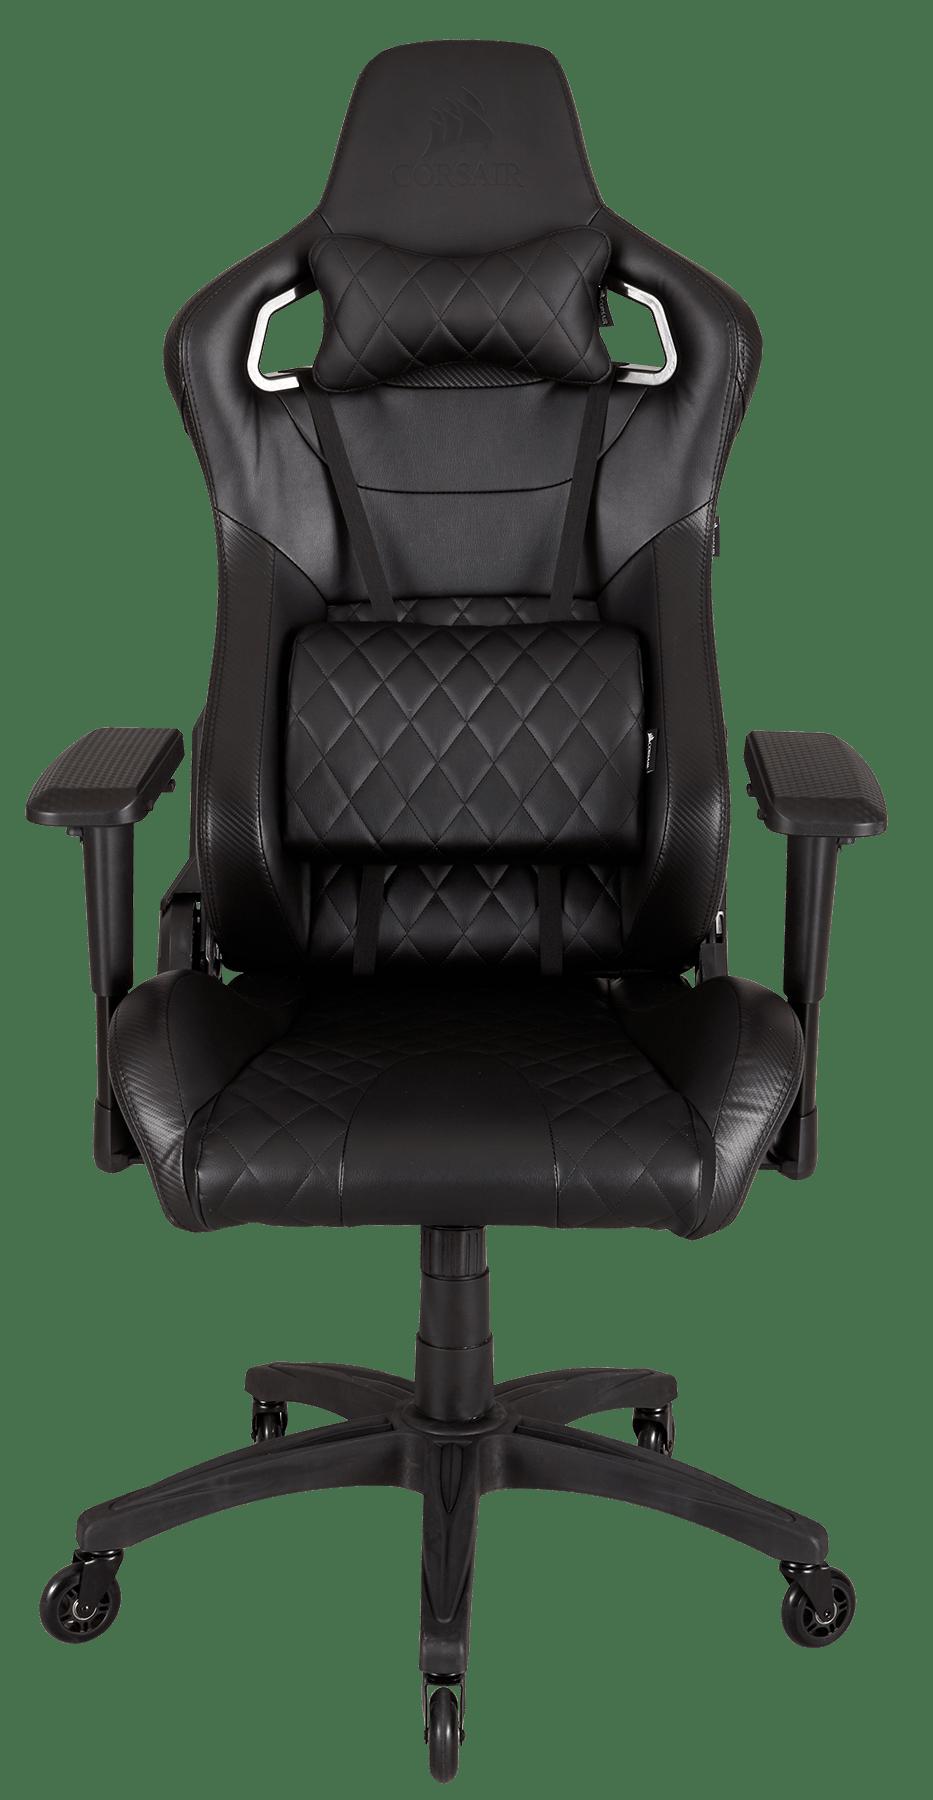 office chair kota kinabalu inexpensive beach chairs corsair t1 race gaming high back desk and media